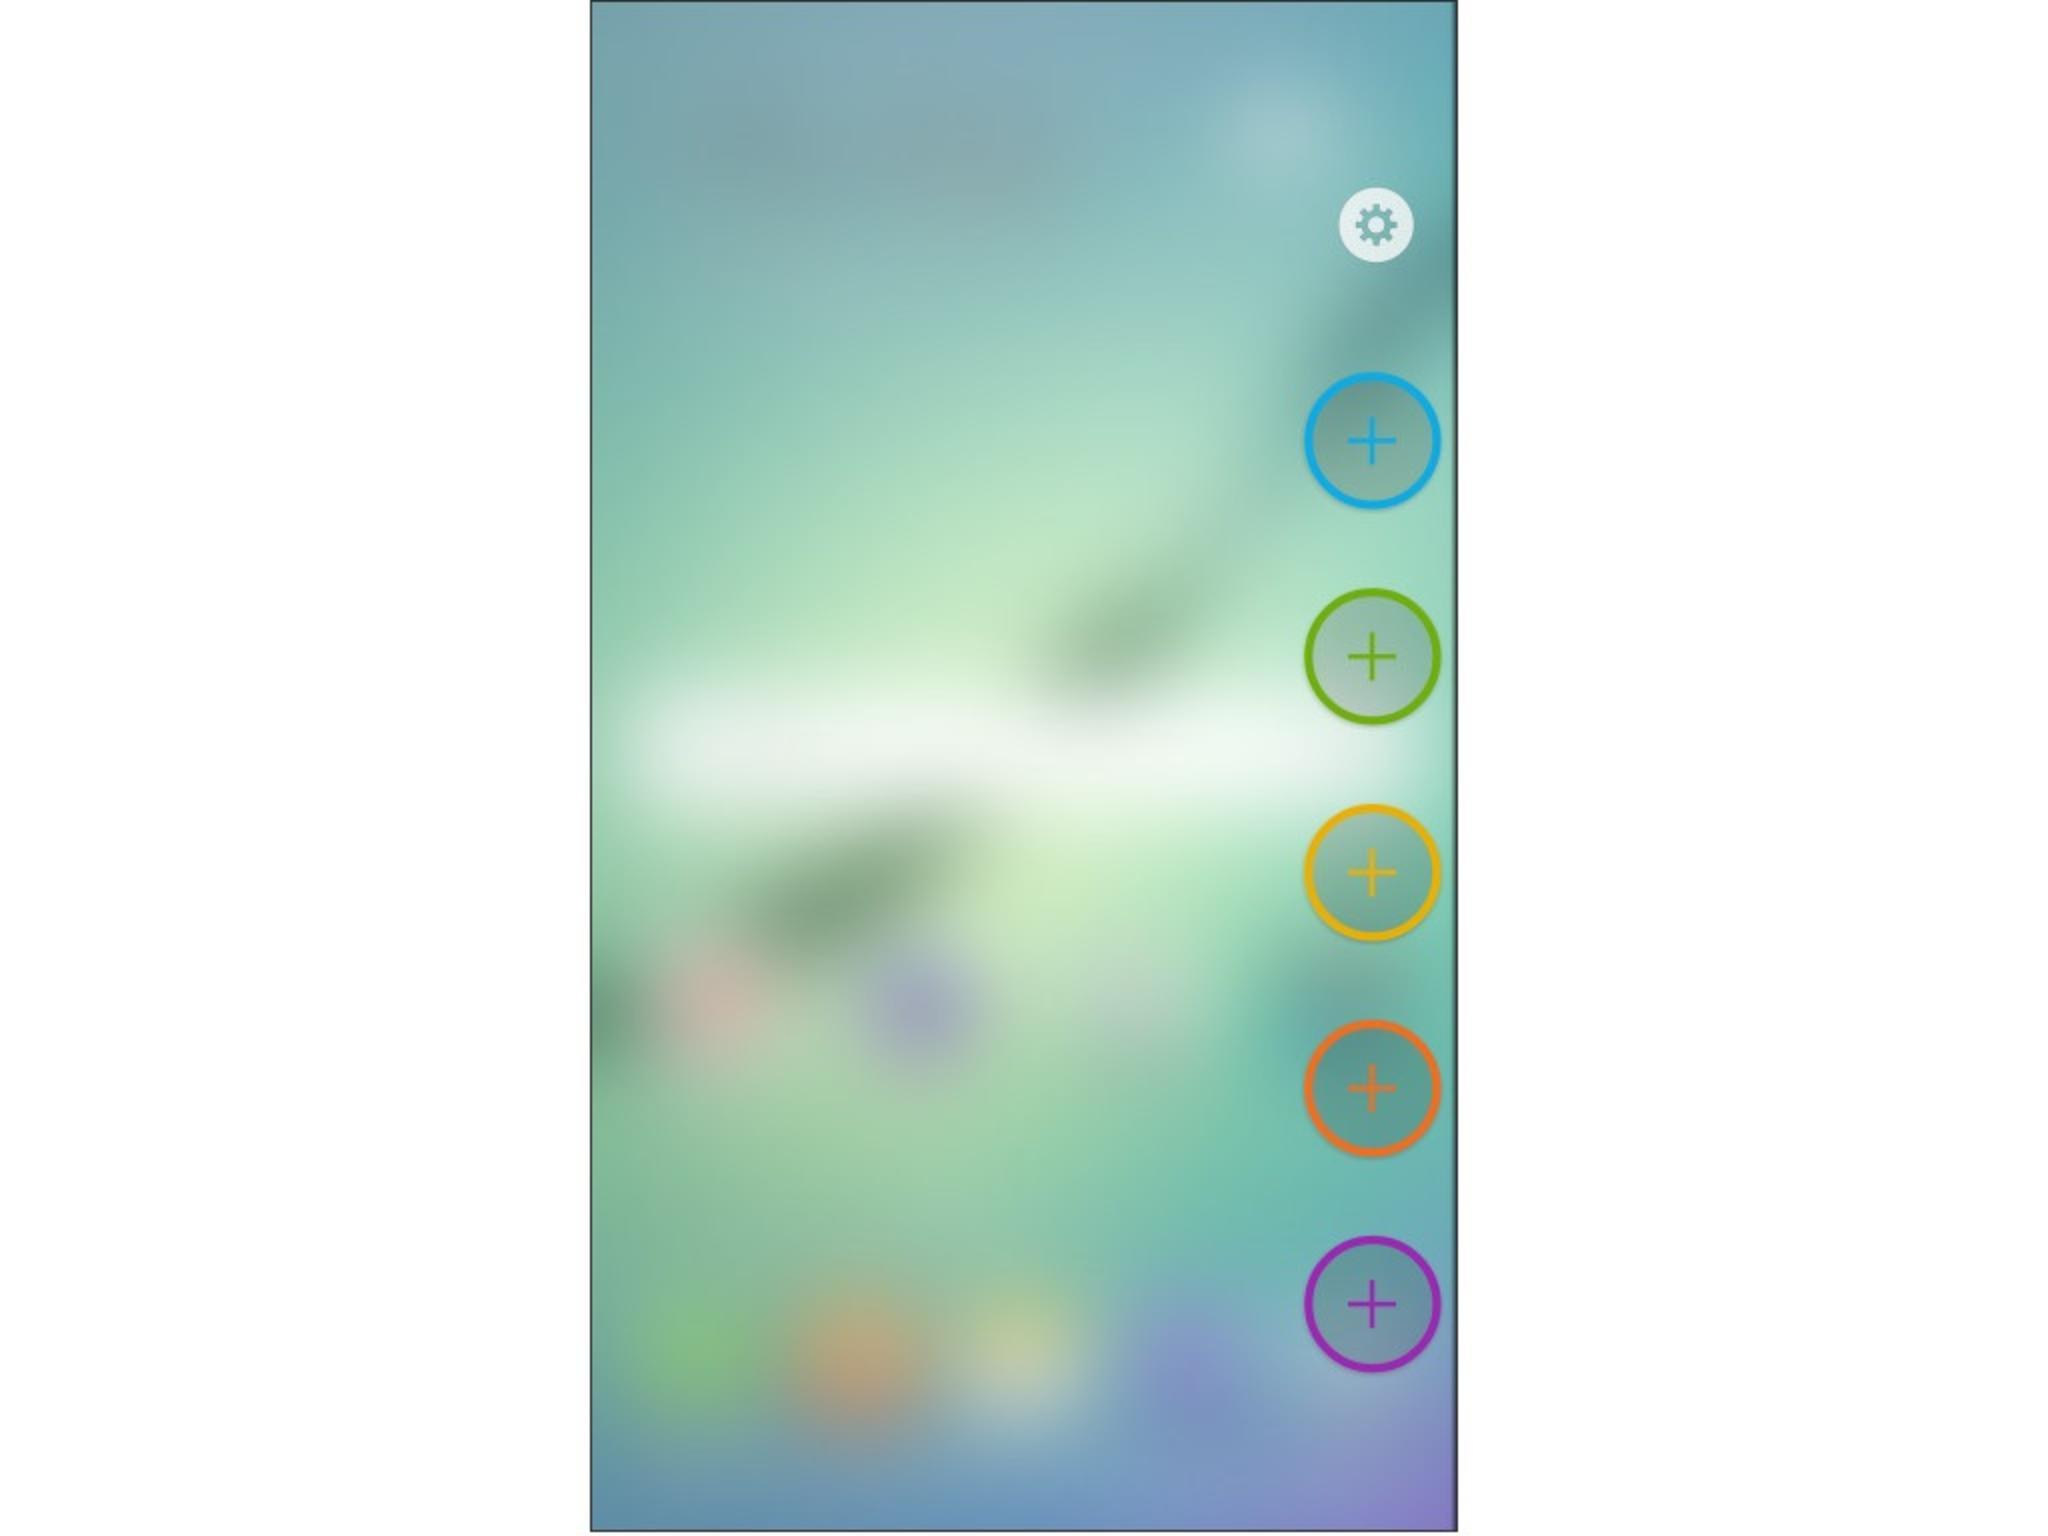 Galaxy S6 Screenshot 13